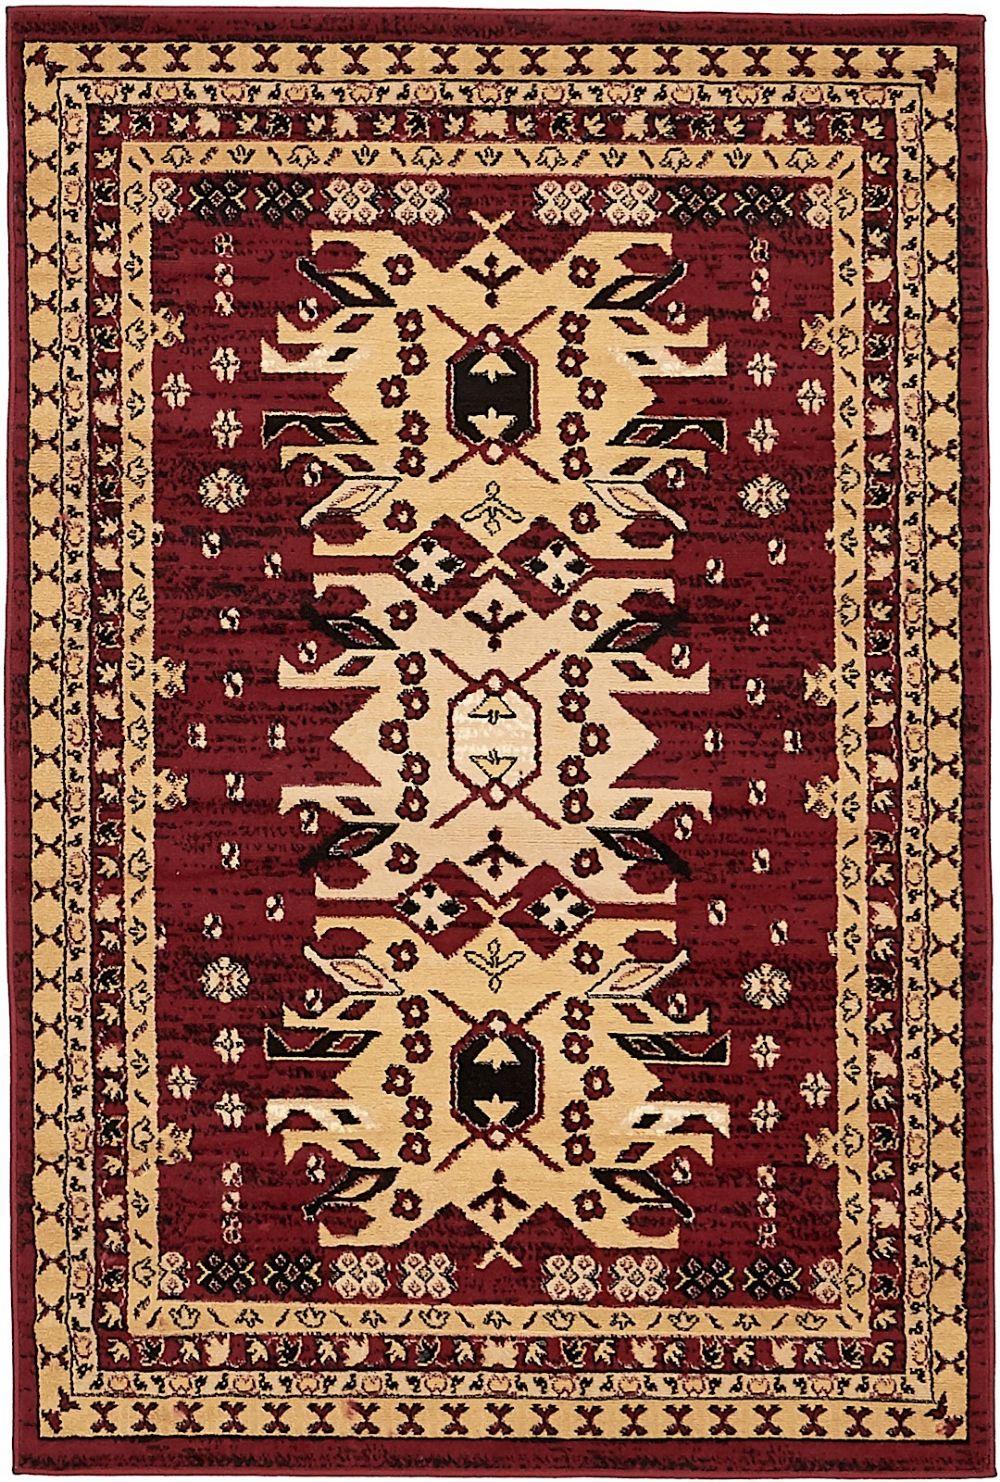 rugpal multan southwestern/lodge area rug collection